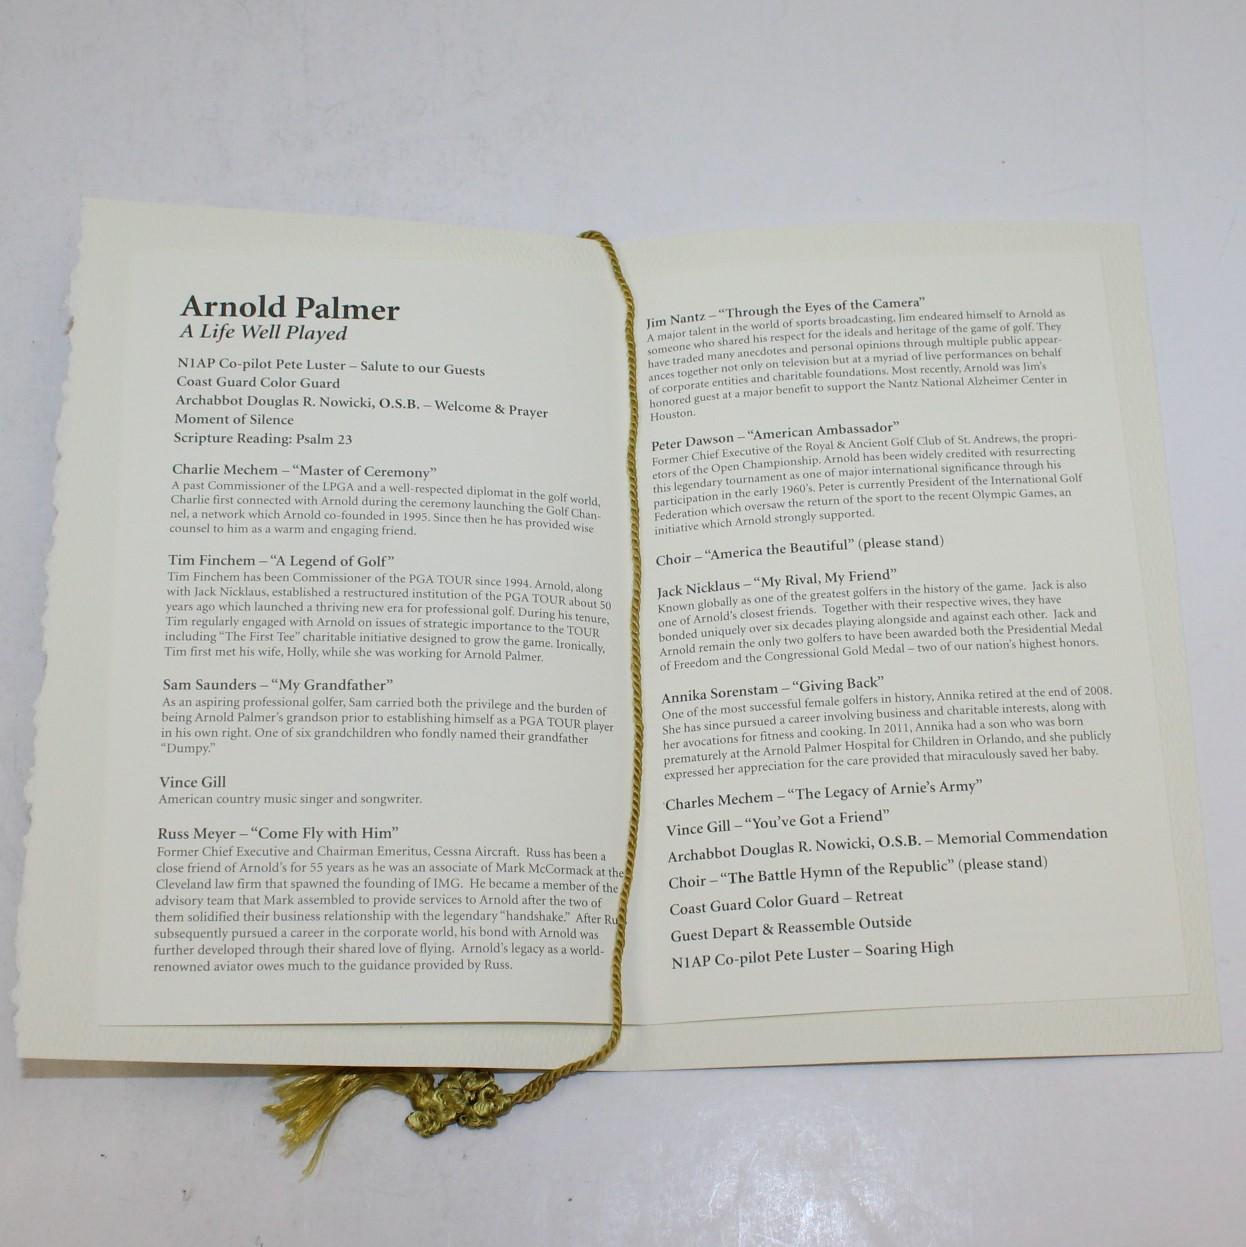 arnold palmer memorial funeral service program